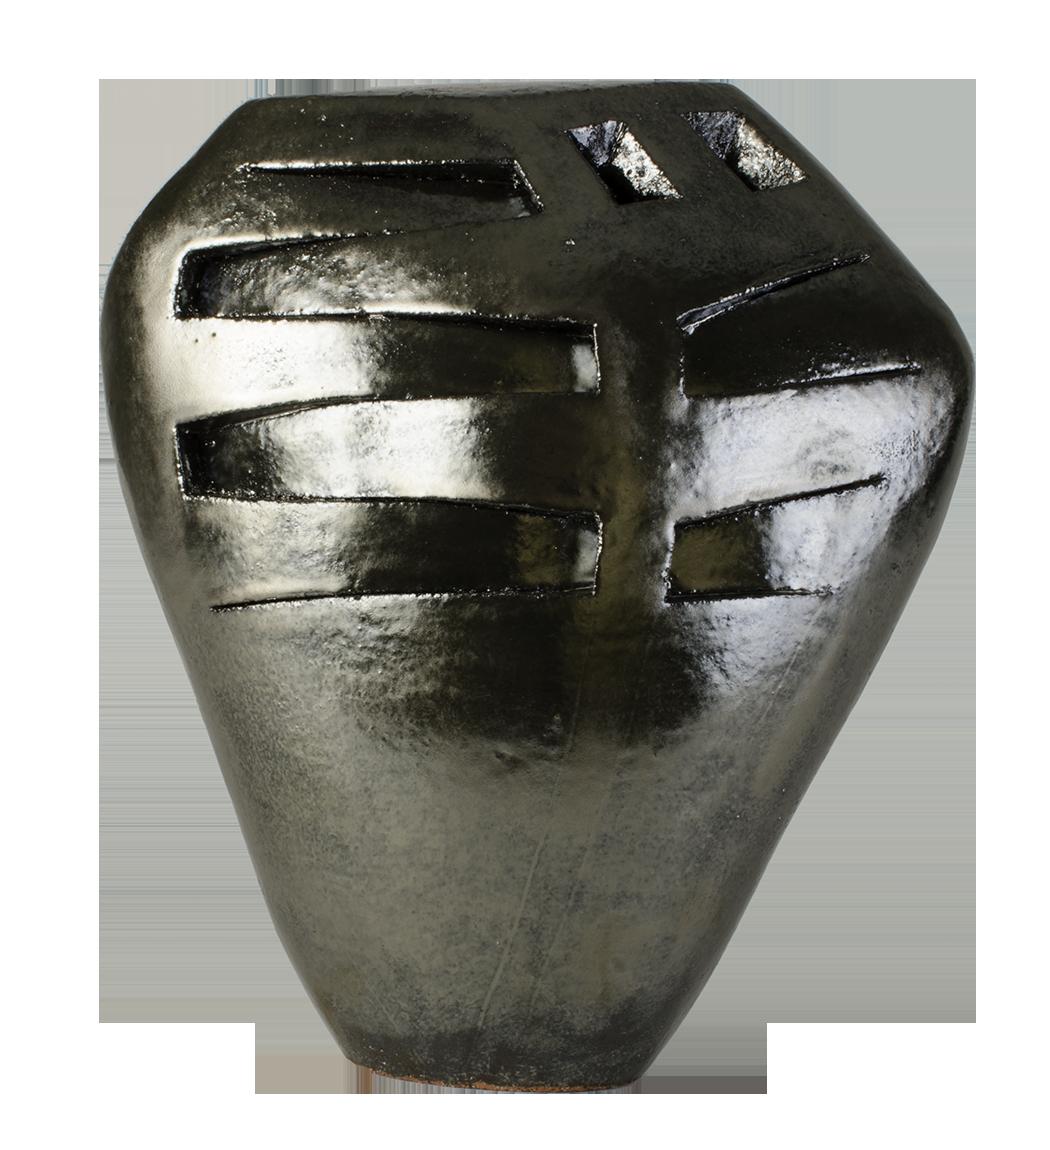 Susan Budge    Puncture Shield,  2016   Ceramic, 9.5 x 8 x 4 inches